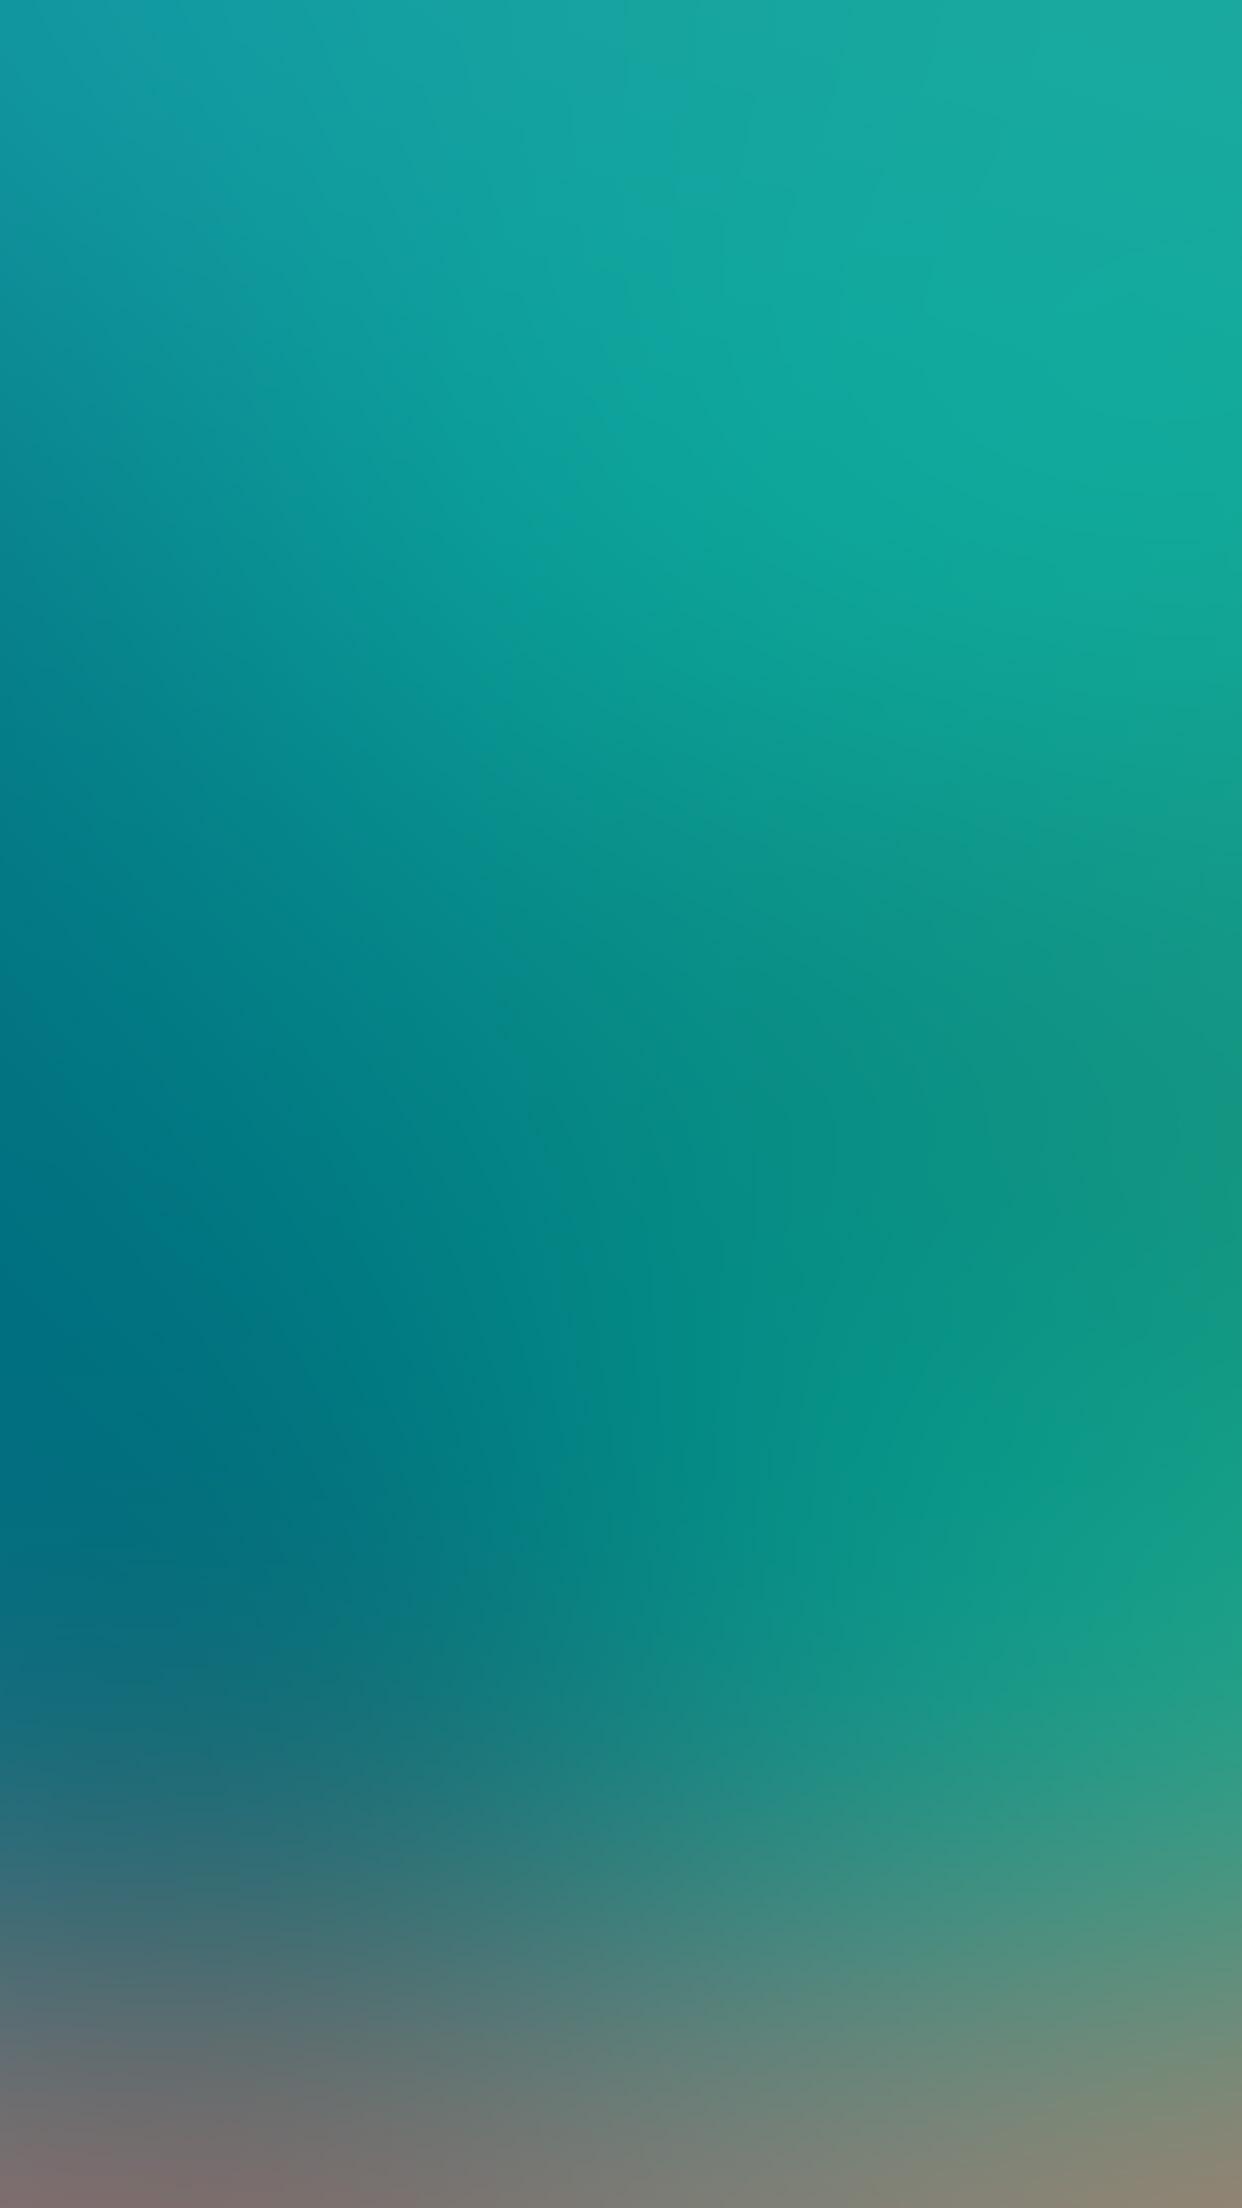 Iphonepapers Com Iphone 8 Wallpaper Si72 Green Emerald